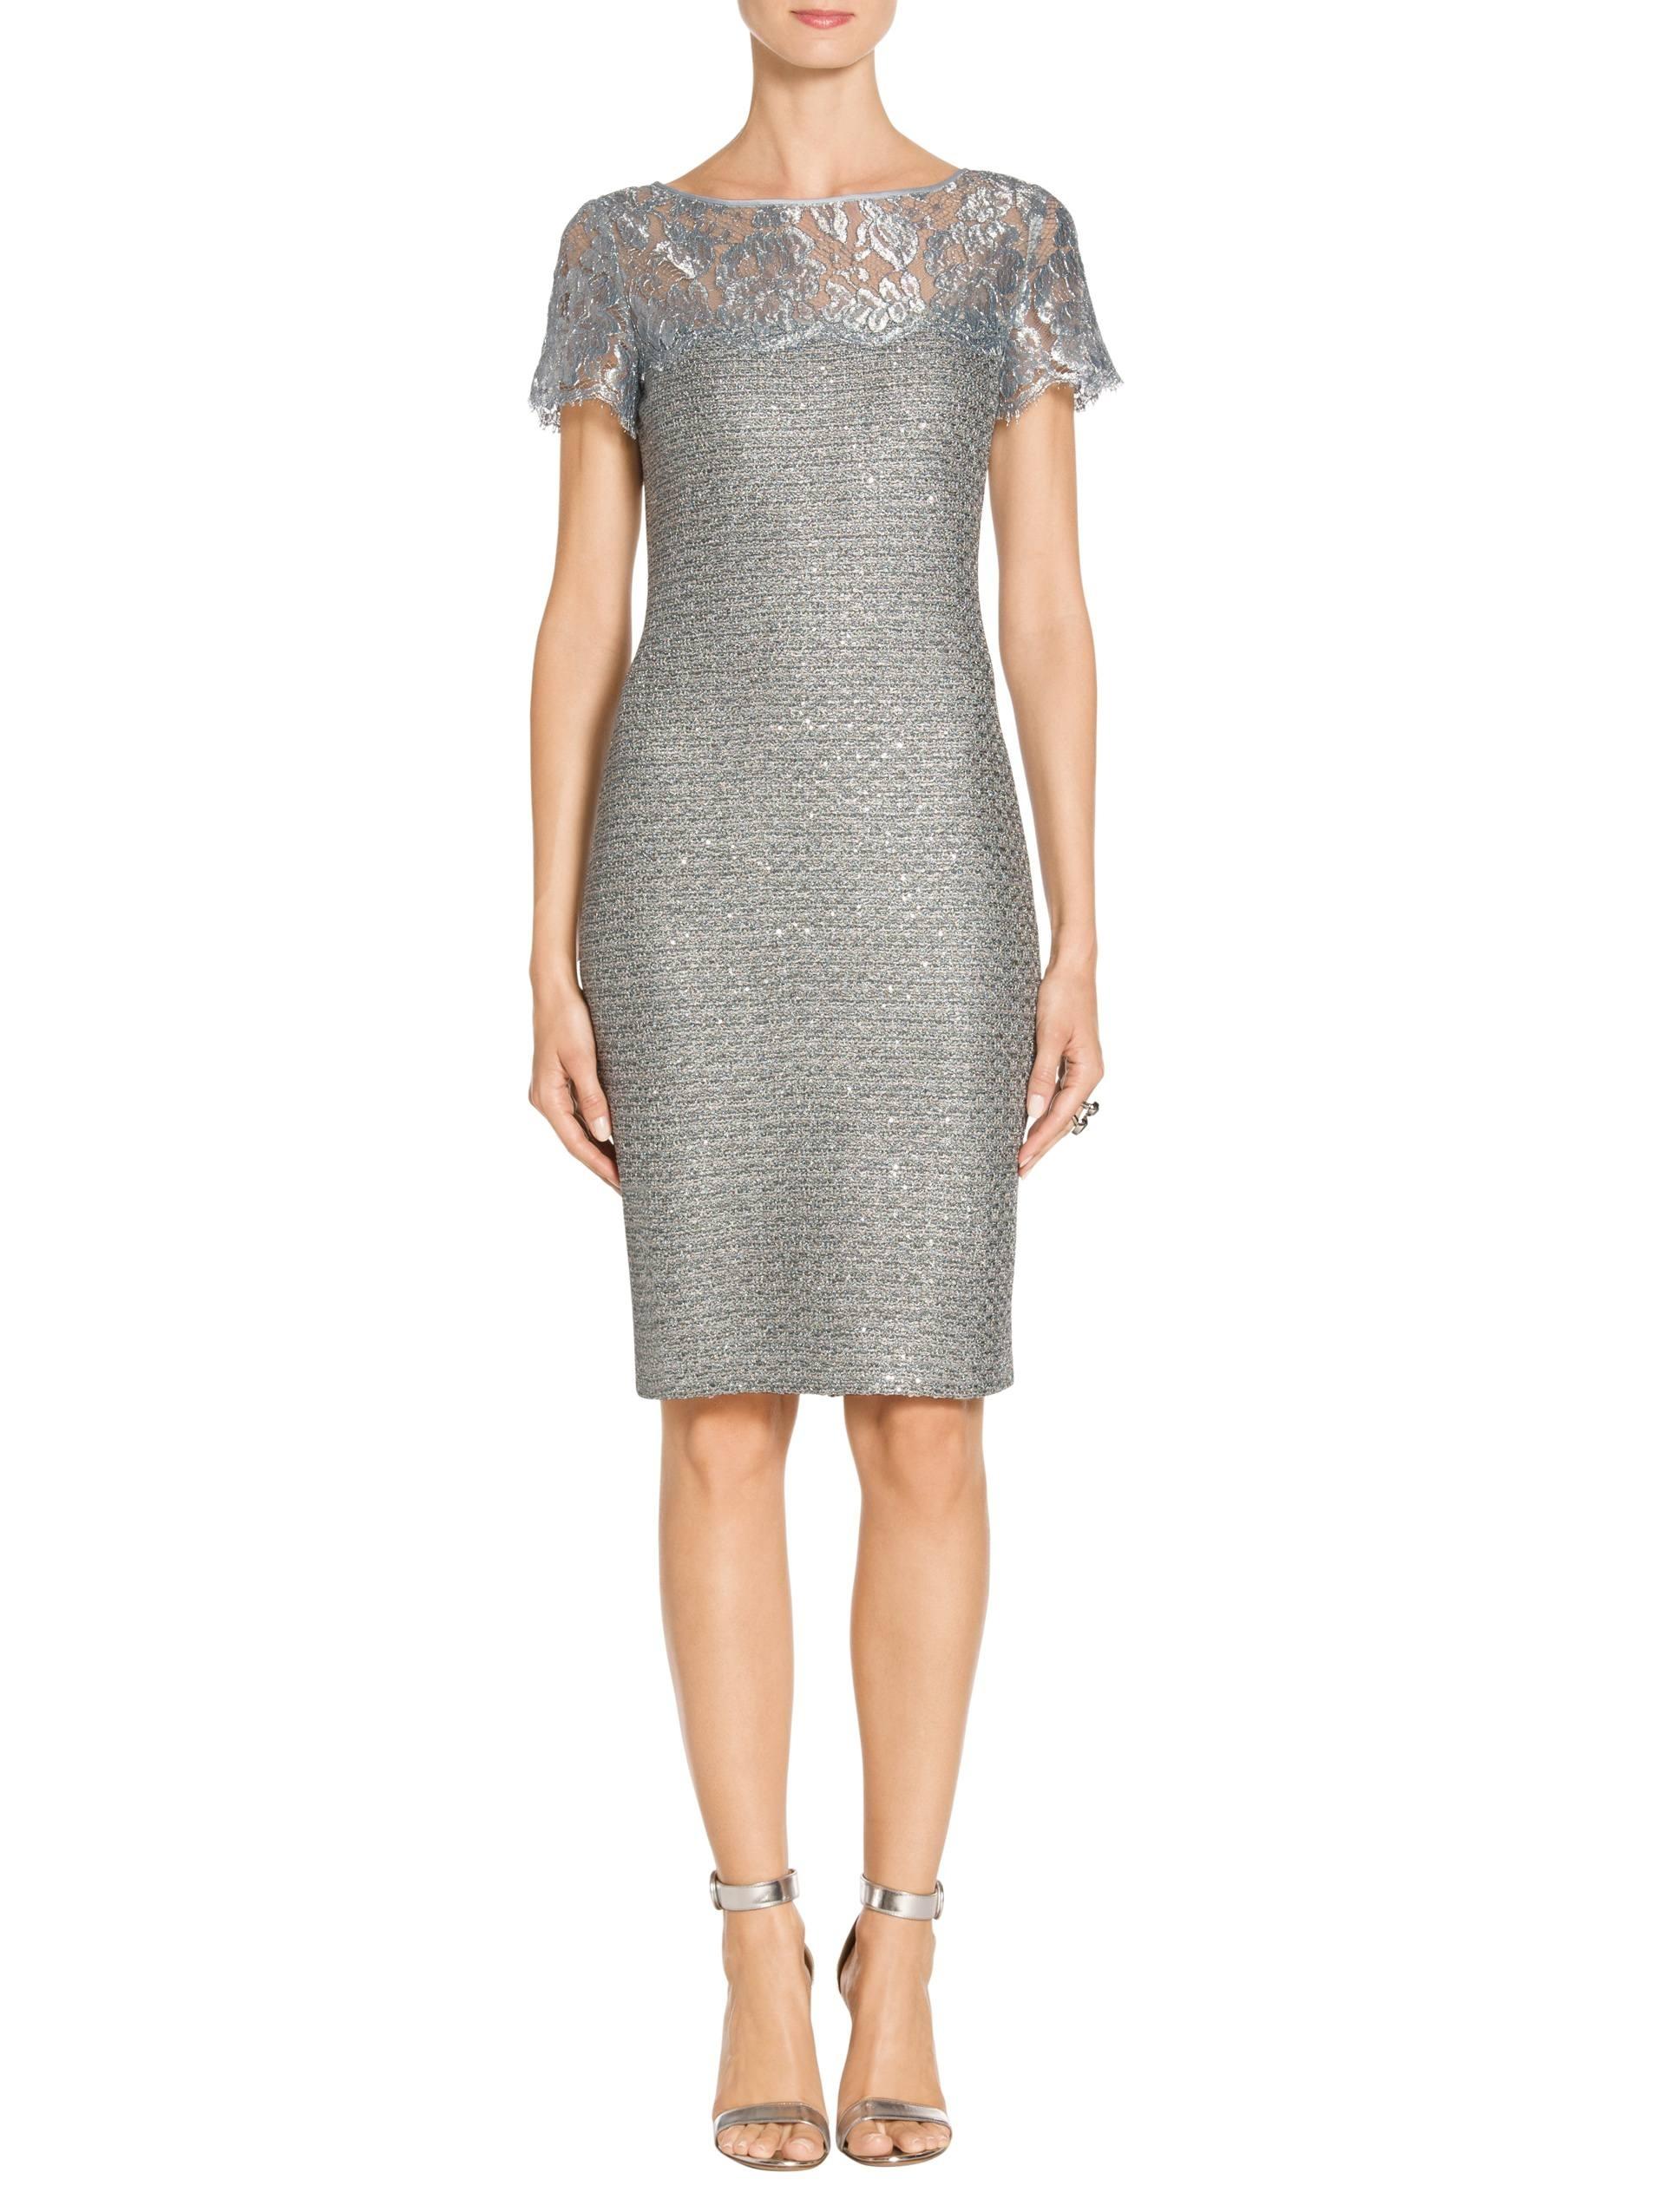 Shop designer cocktail dresses st john knits metallic sequin knit dress ombrellifo Images